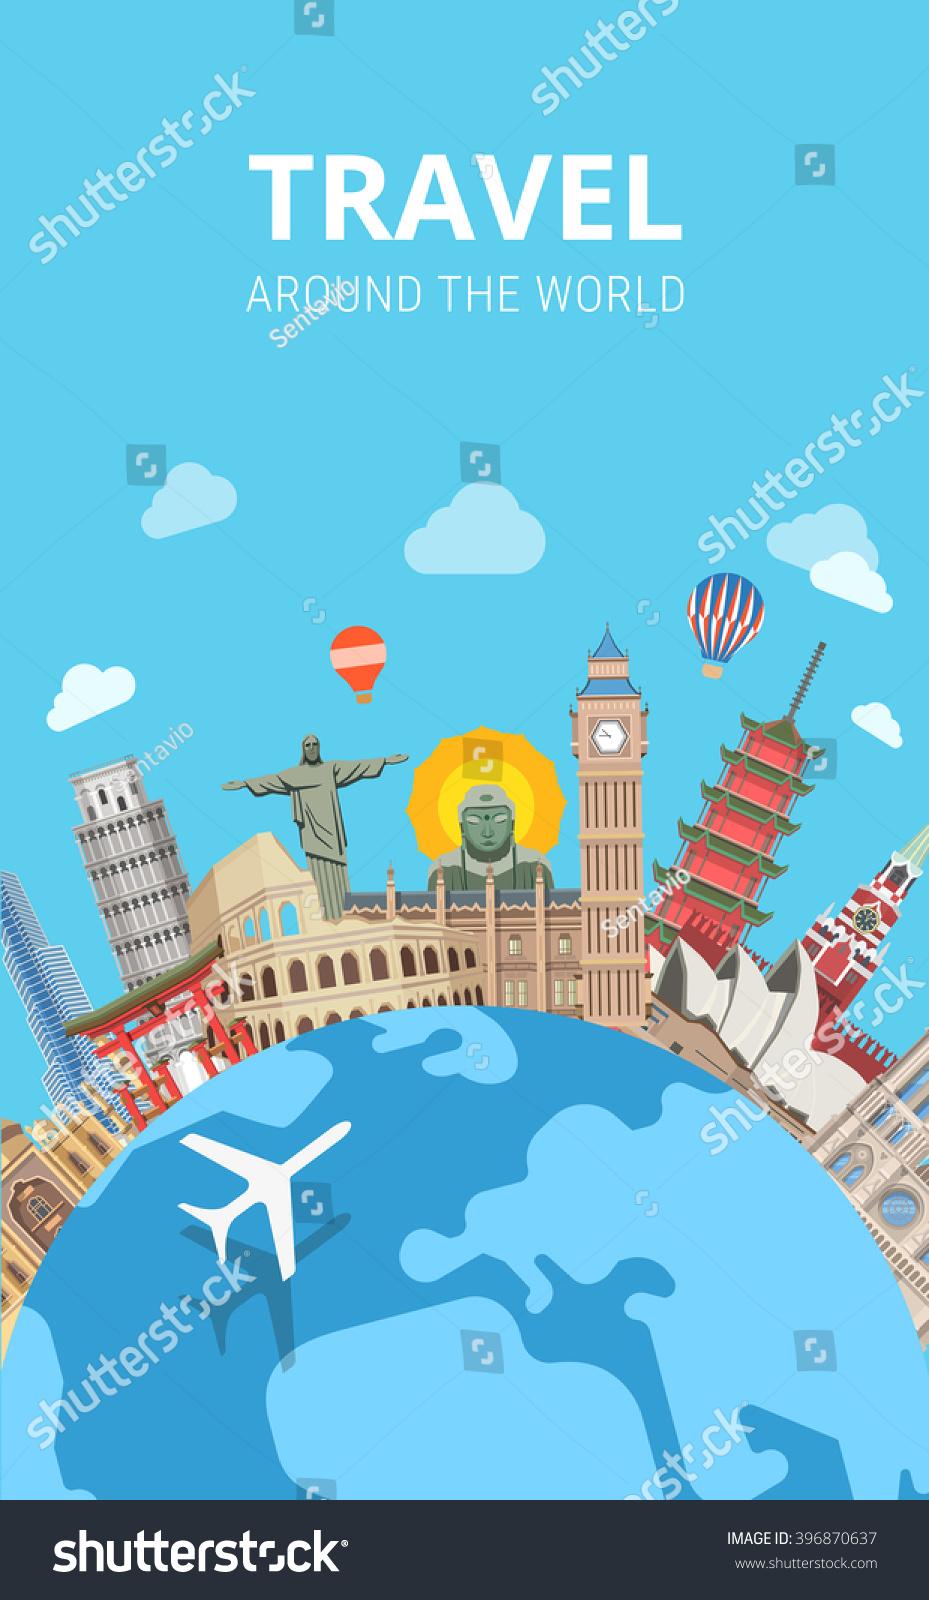 Travel around world sightseeing template flyer stock for Around the world cruise